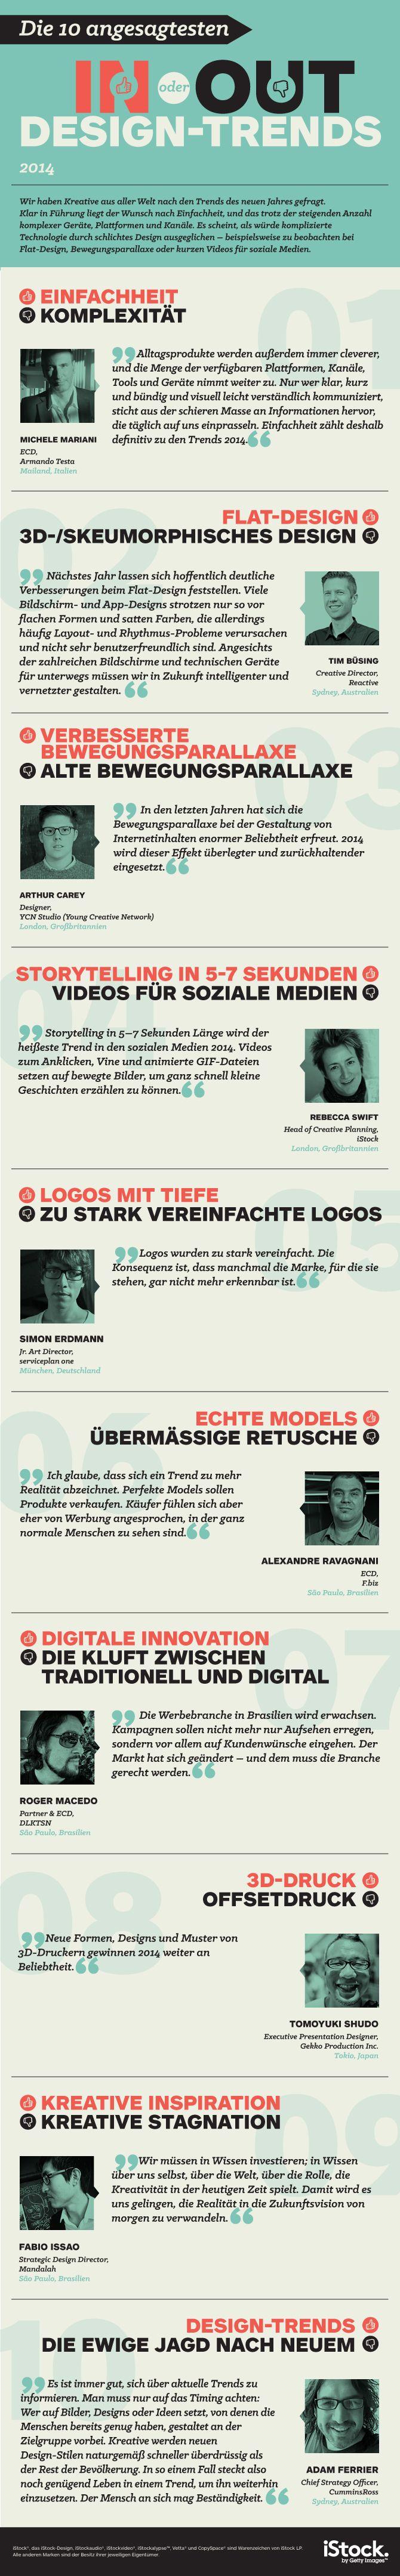 Web- und Grafikdesign-Trends 2014 – Infografik – iStock - iStock DE